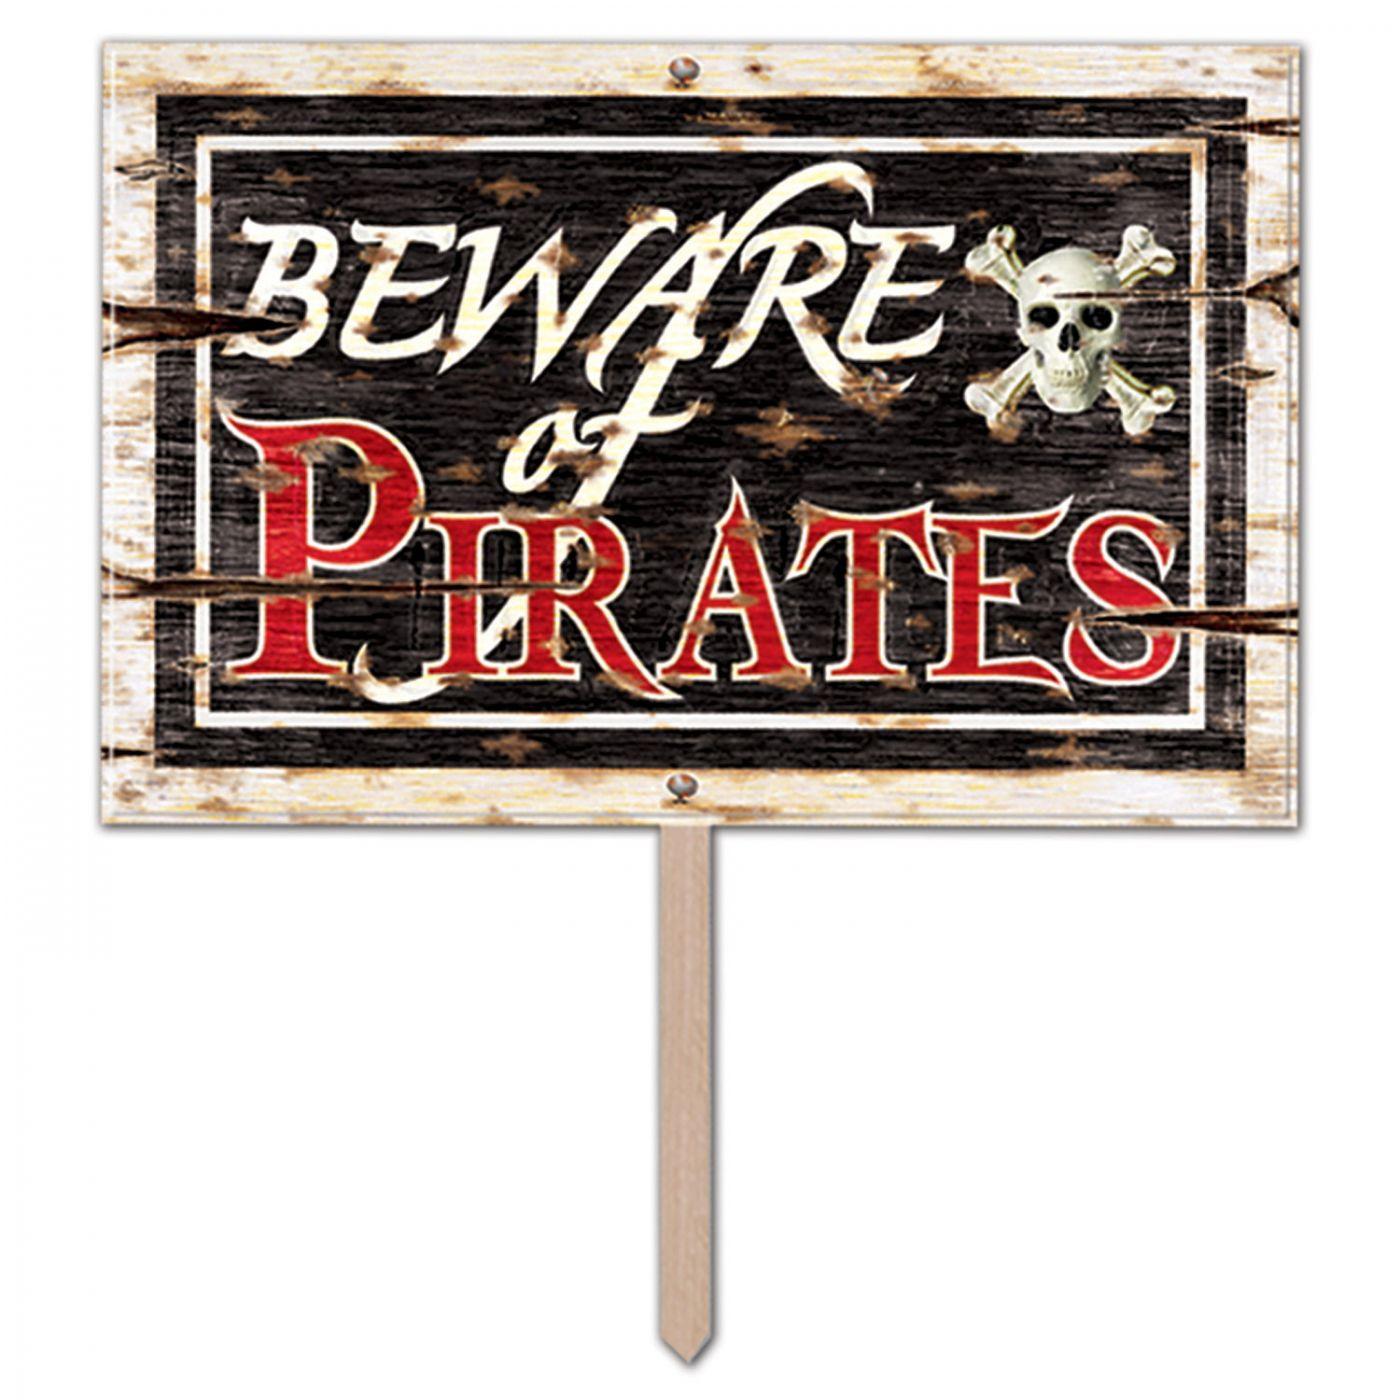 Image of 3-D Plastic Beware Of Pirates Yard Sign (6)